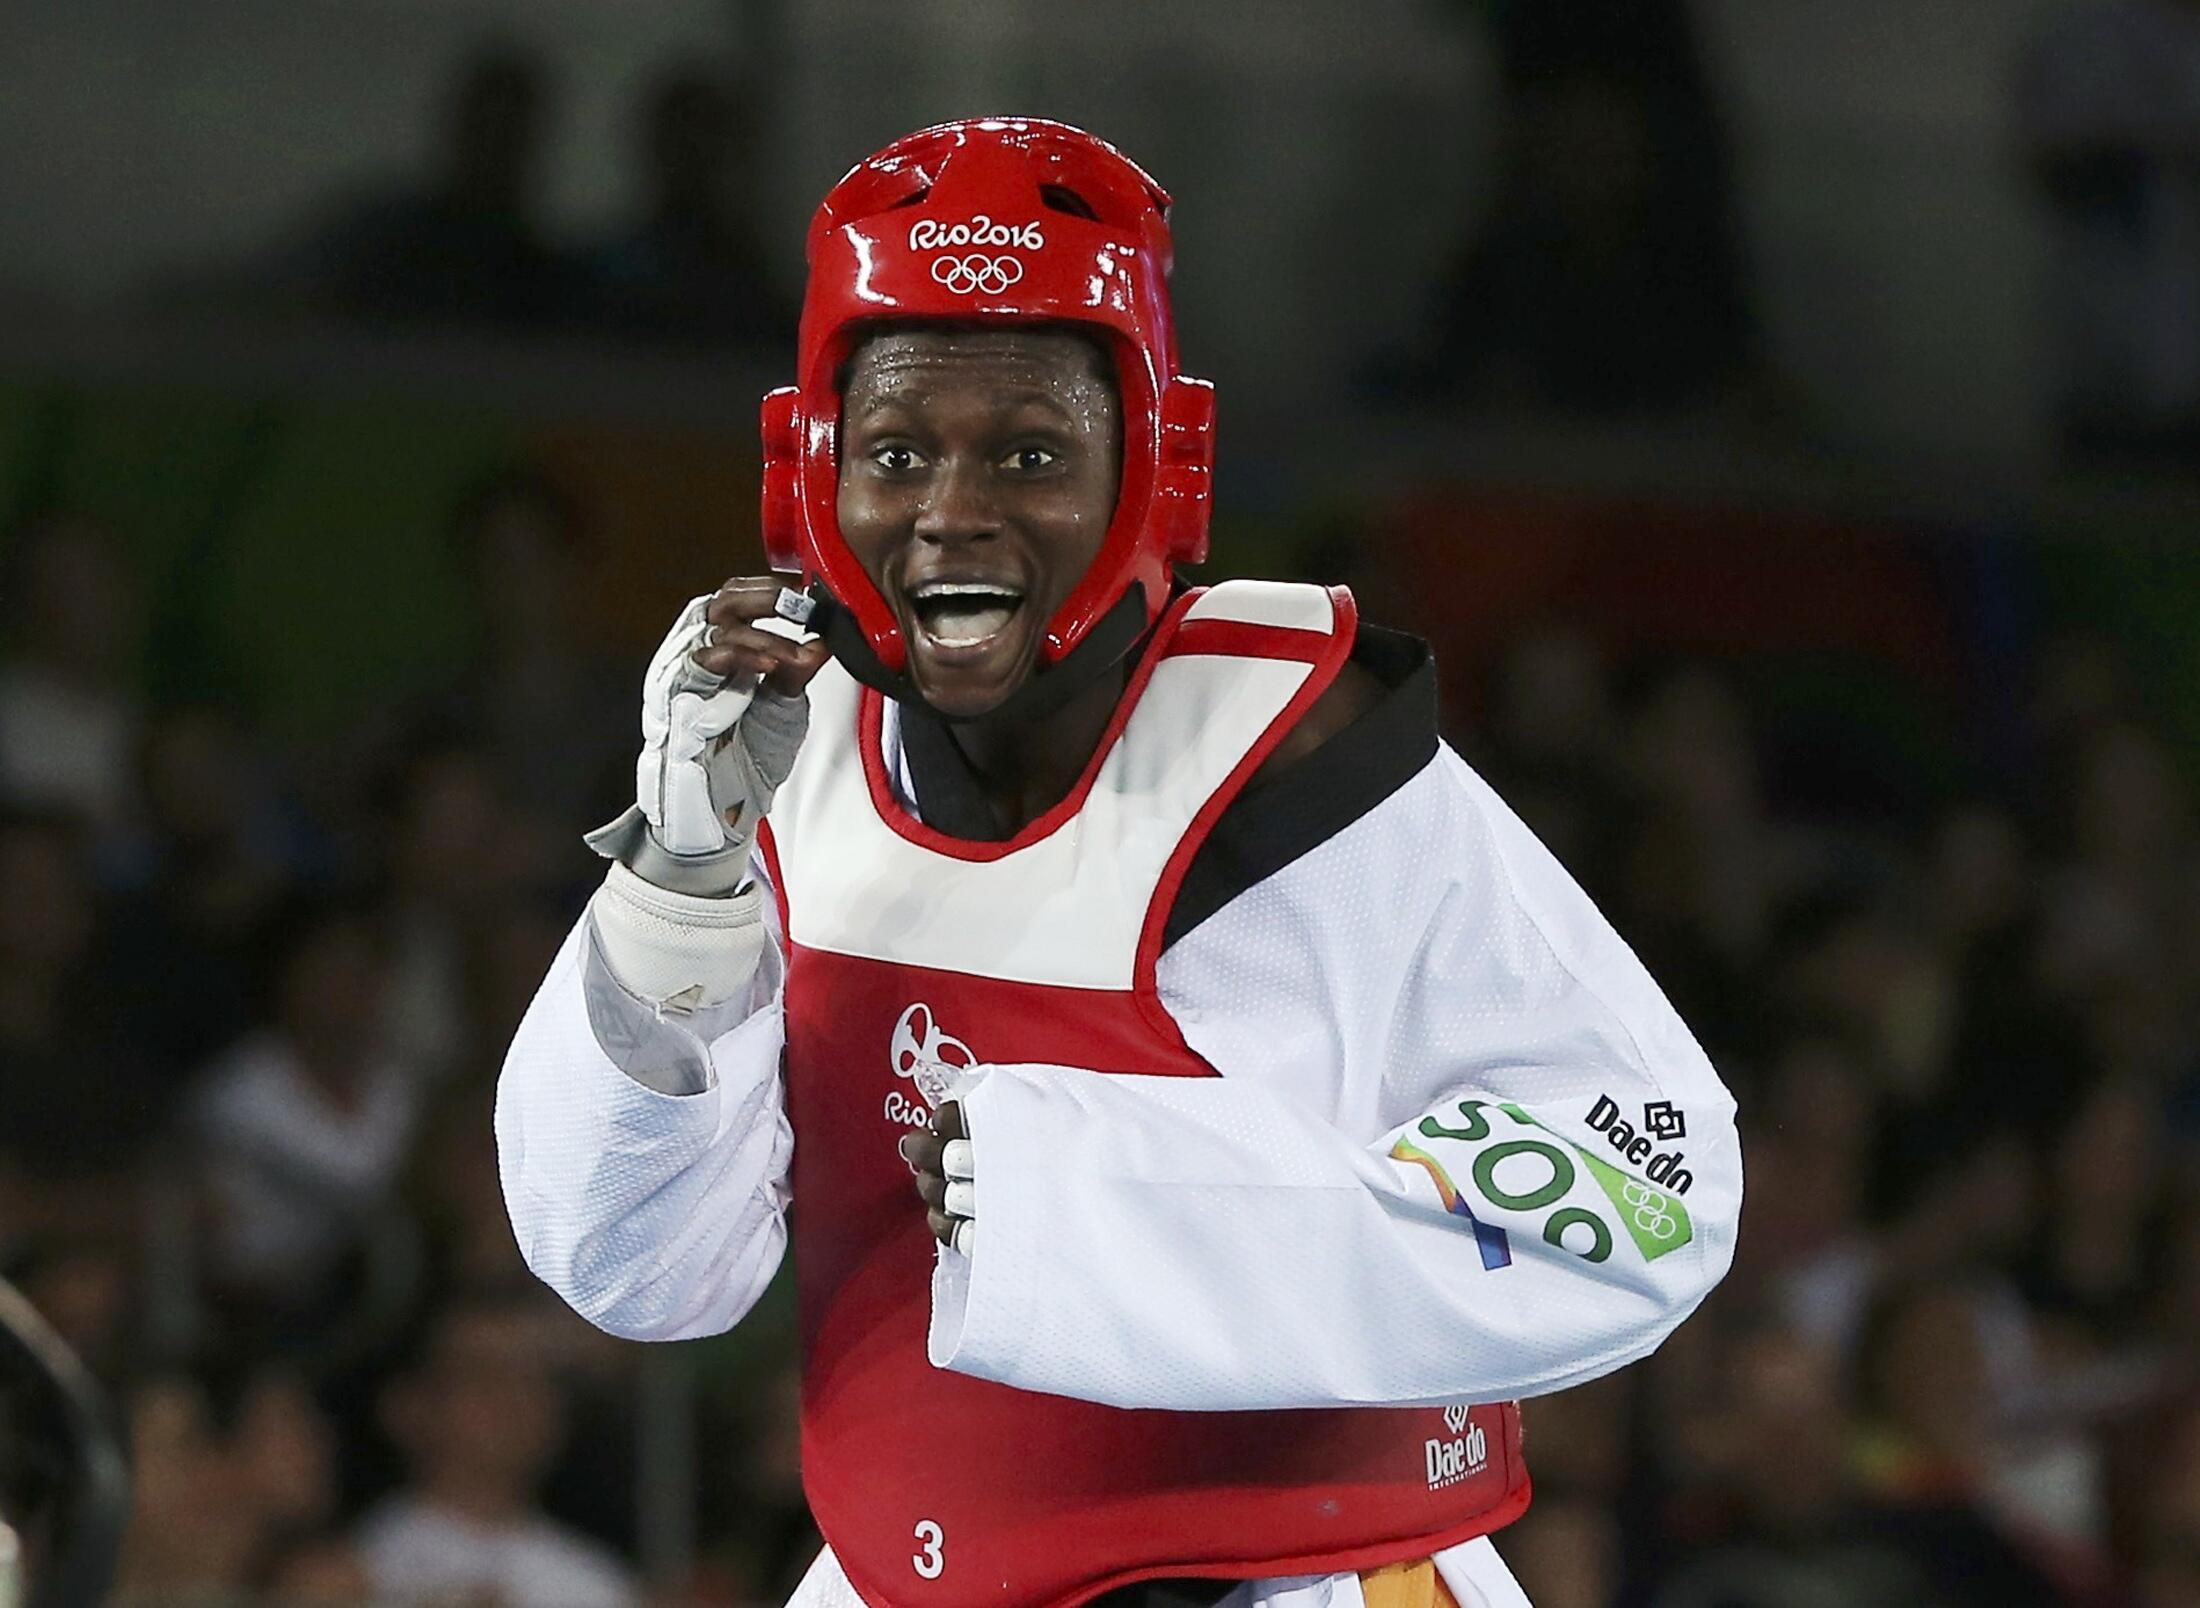 L'Ivoirienne Ruth Gbagbi, médaillée de bronze à Rio en taekwondo, le 19 août 2016.